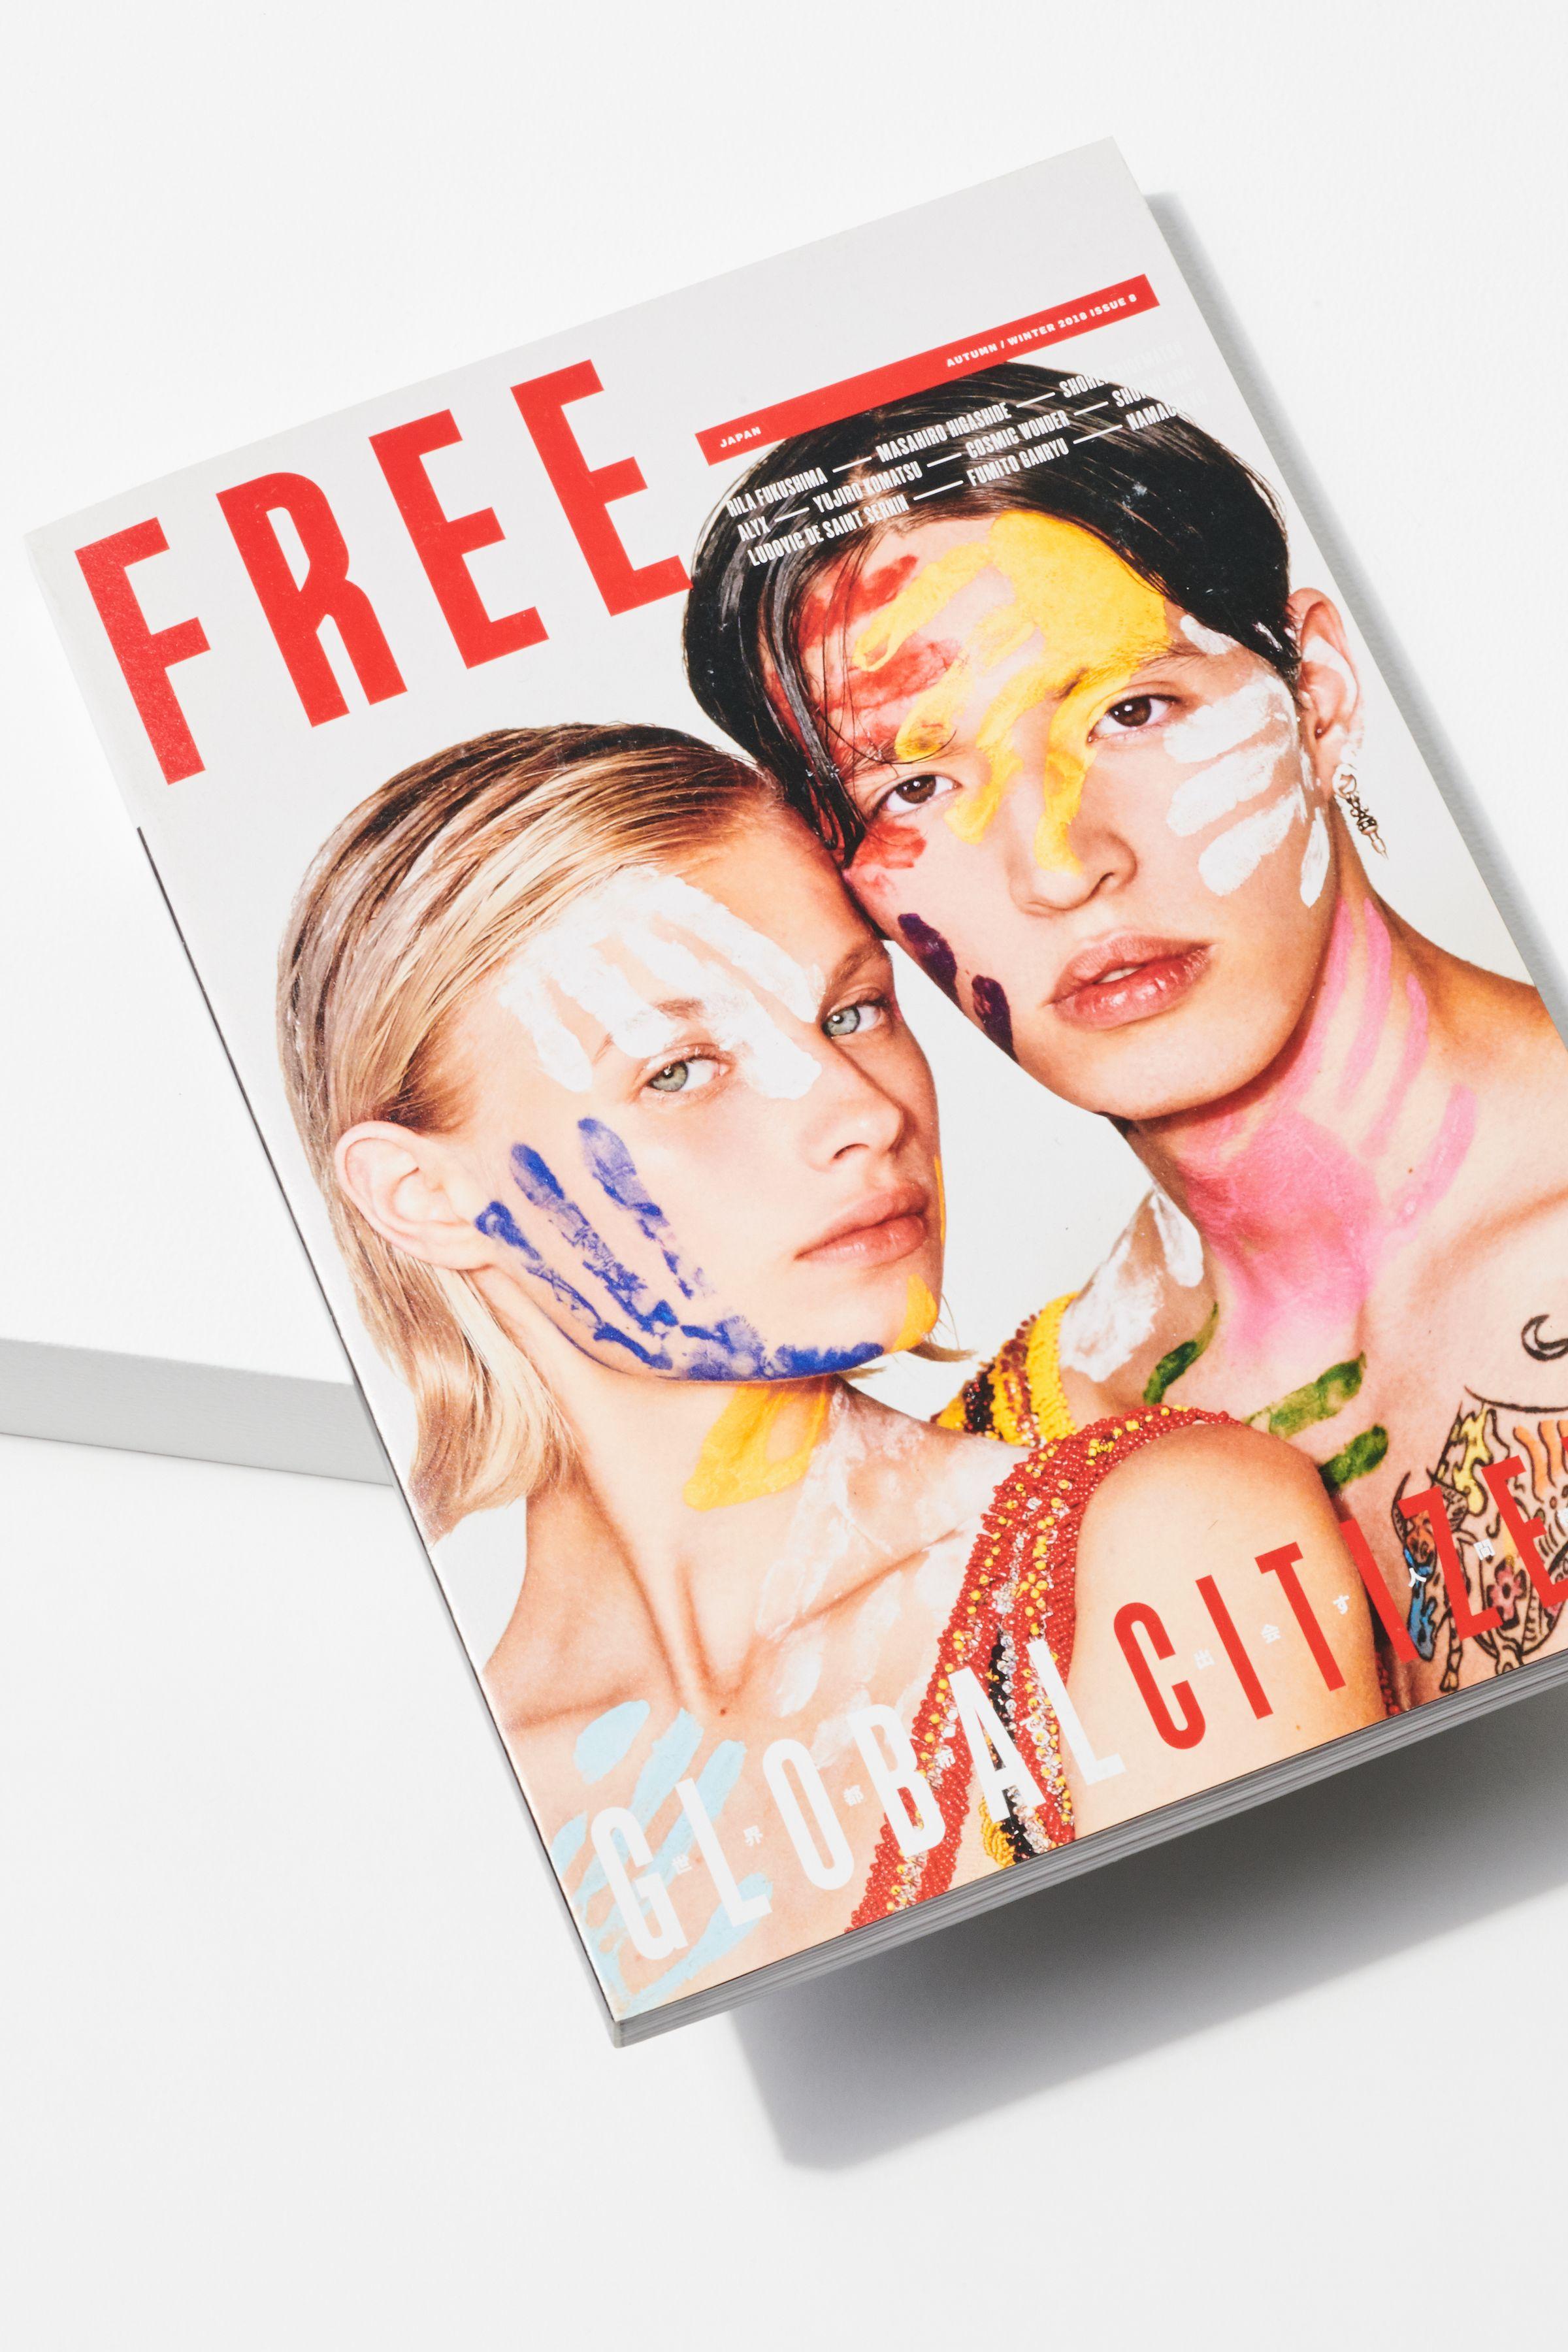 Free Magazine cover design